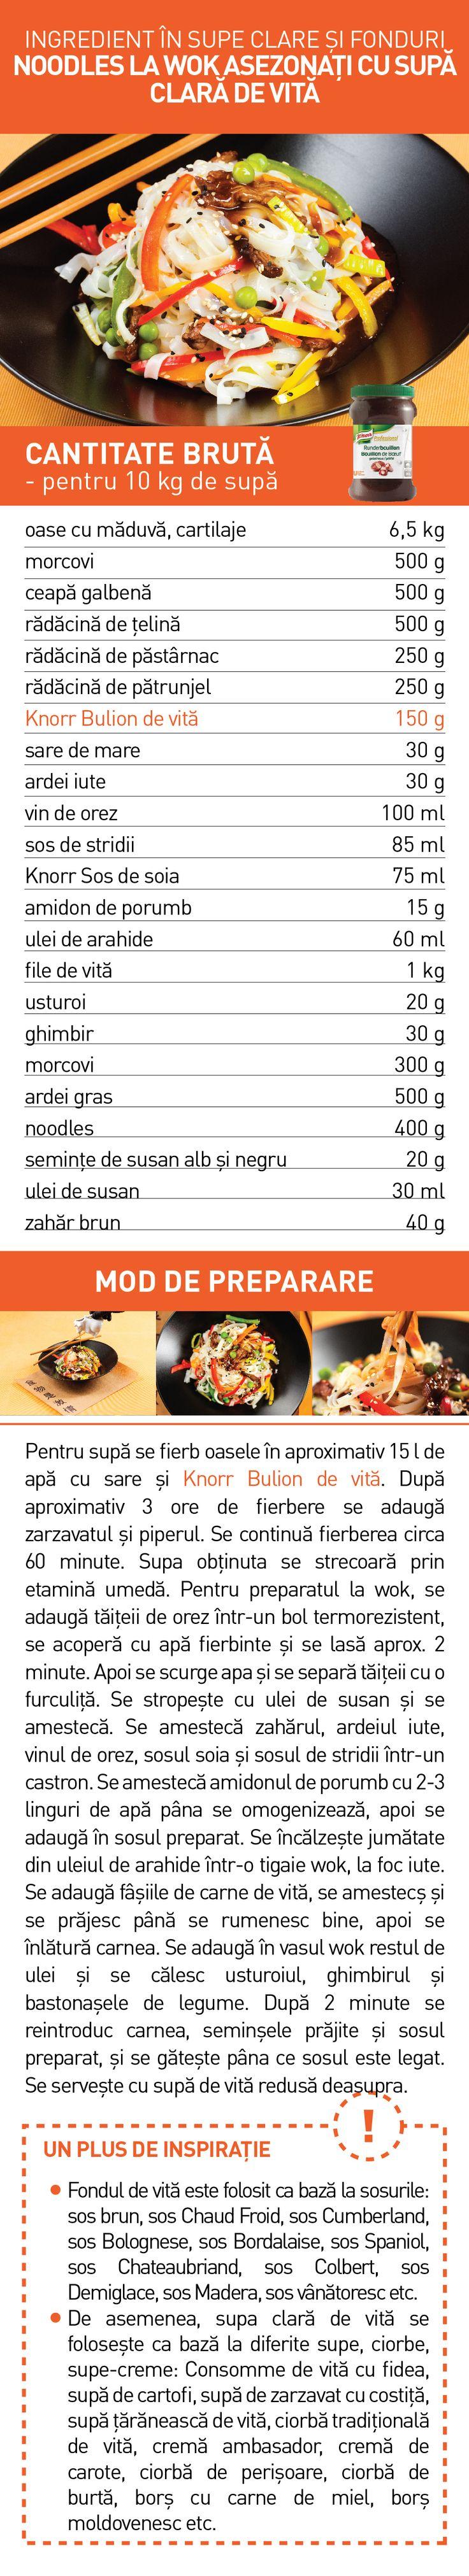 Ingredient in supe clare si fonduri (II) - RETETE